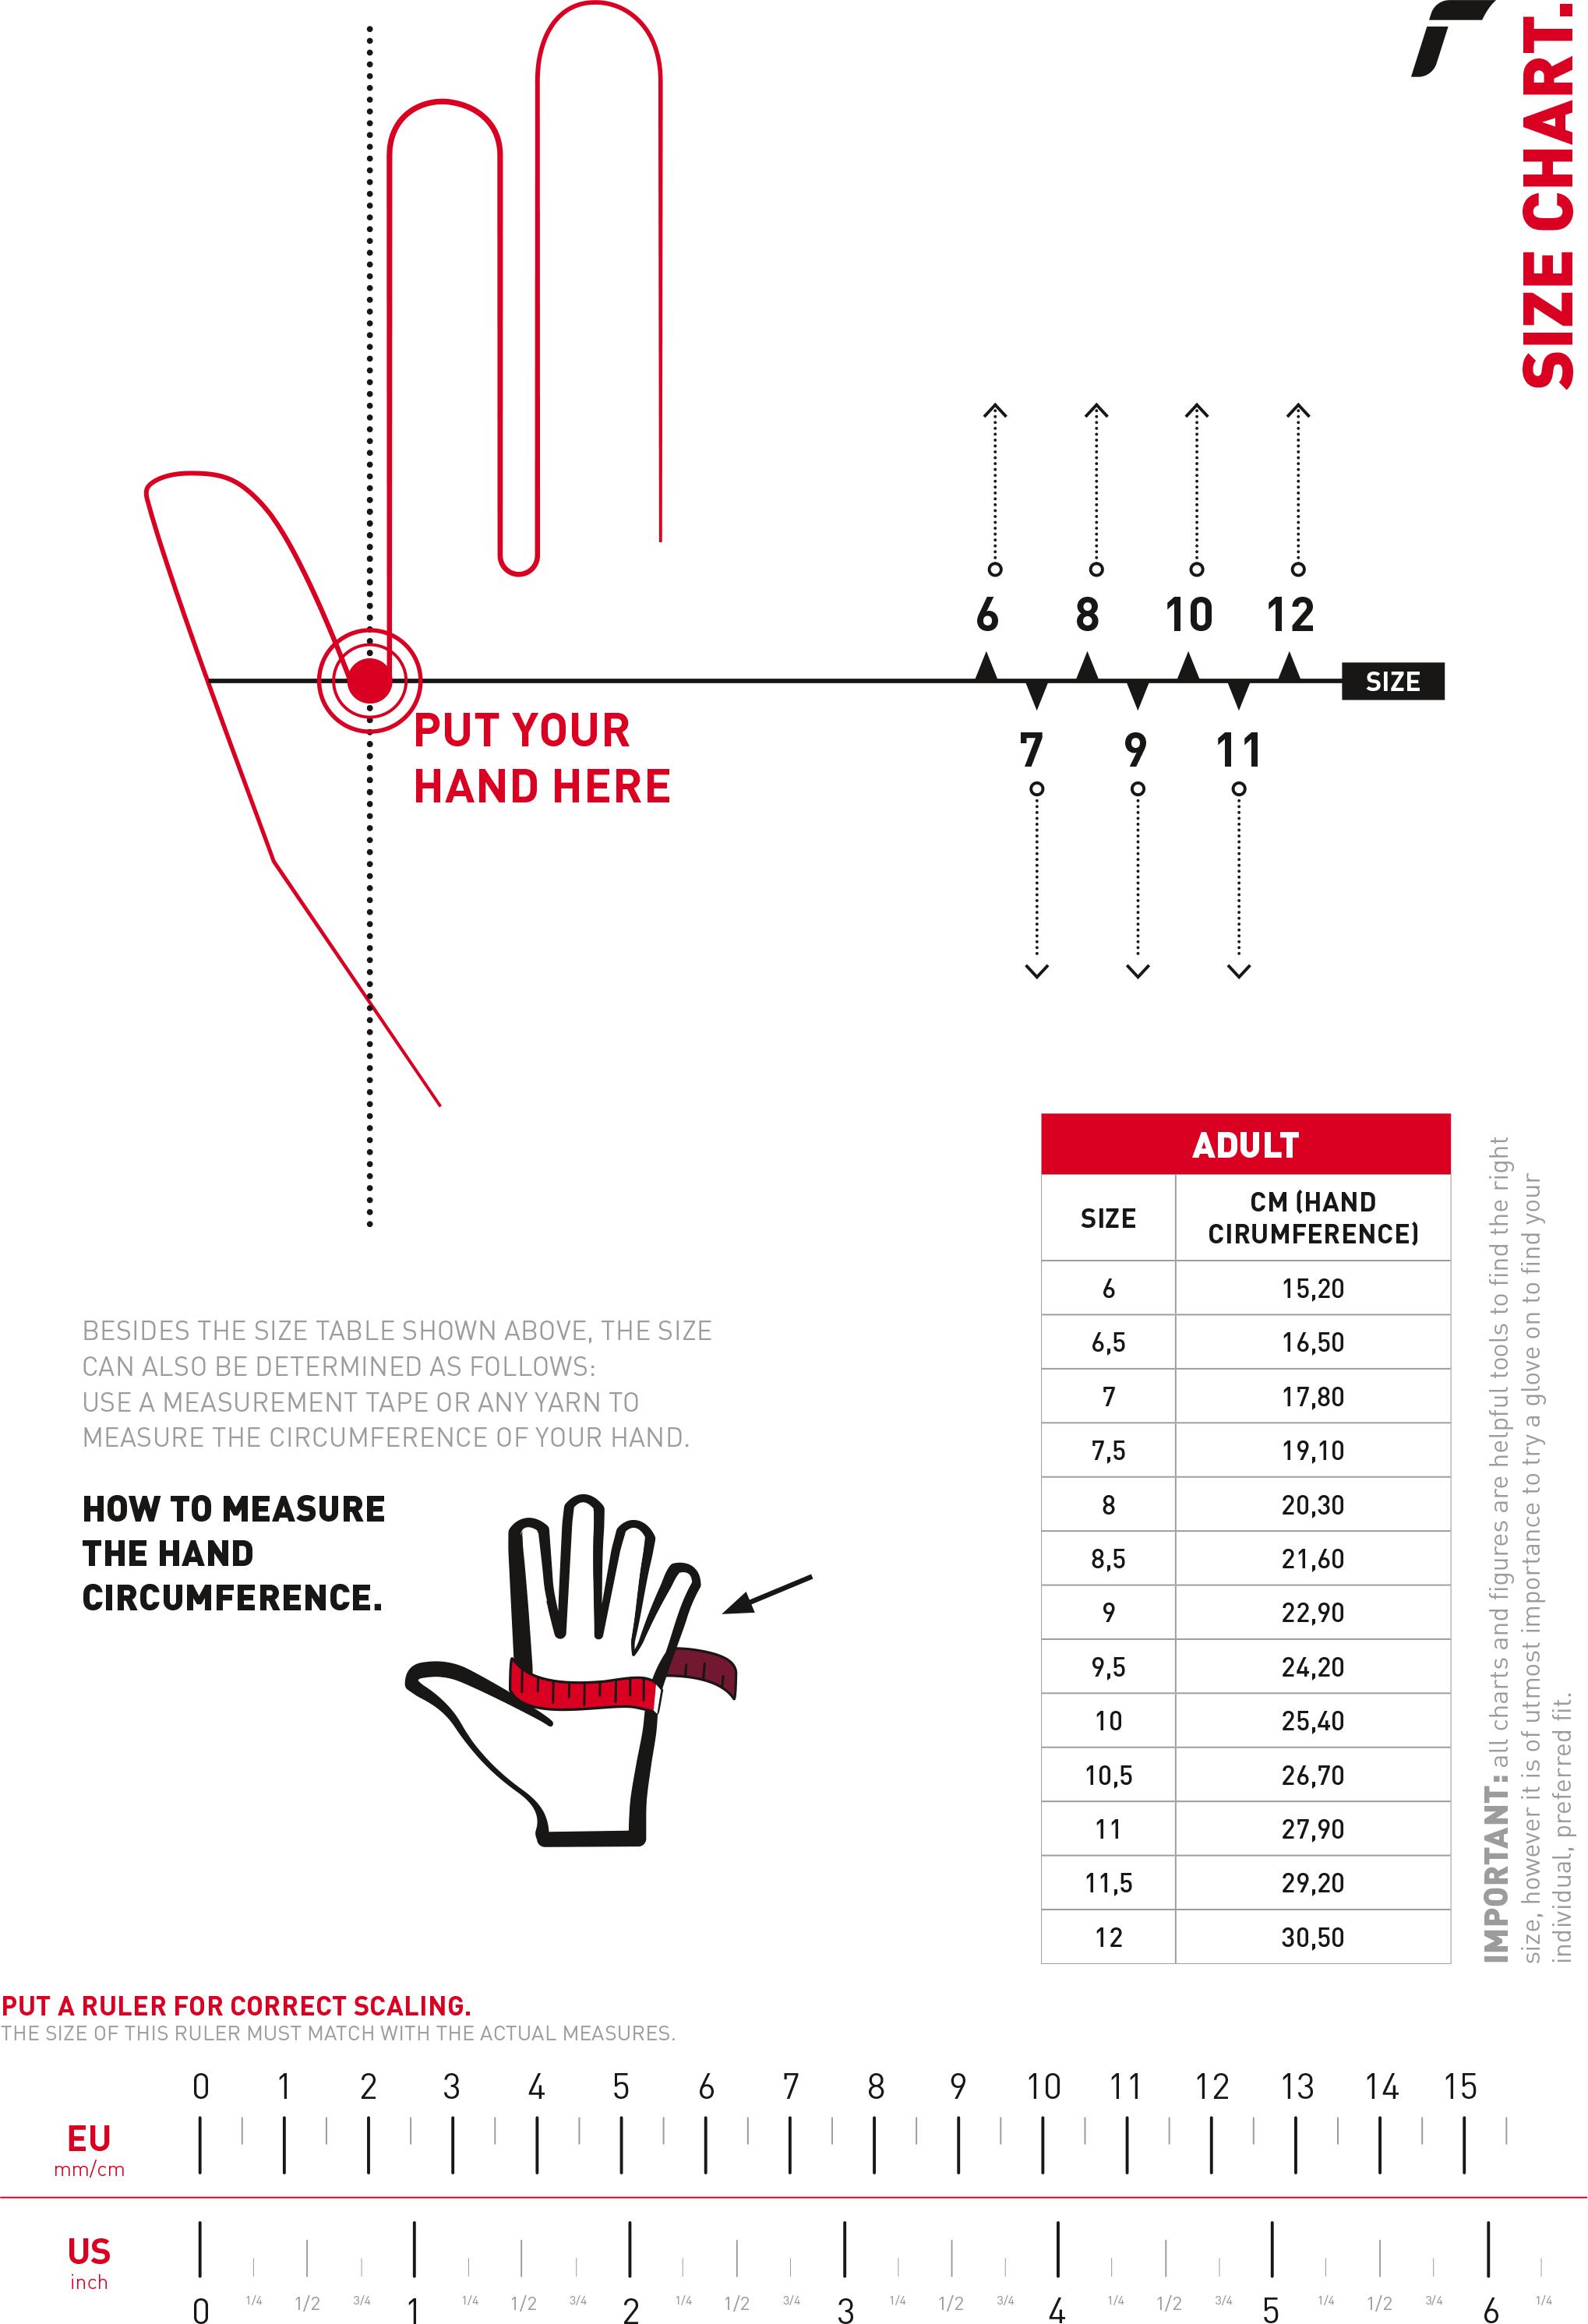 Reusch velikosti rokavic